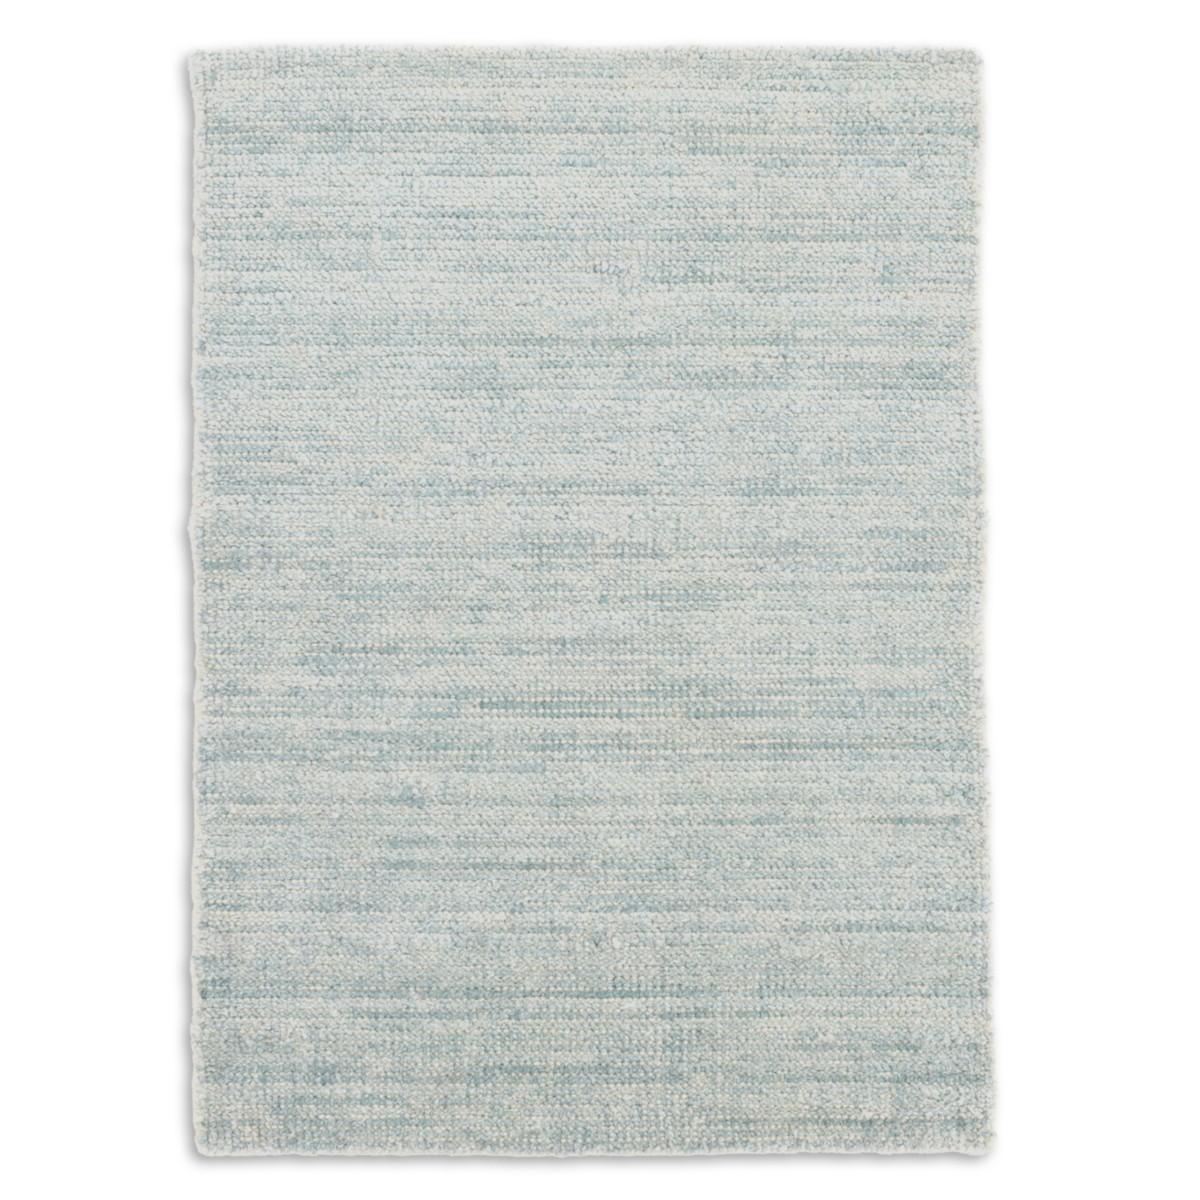 Quartz Woven Viscose/Cotton Rug - Ocean